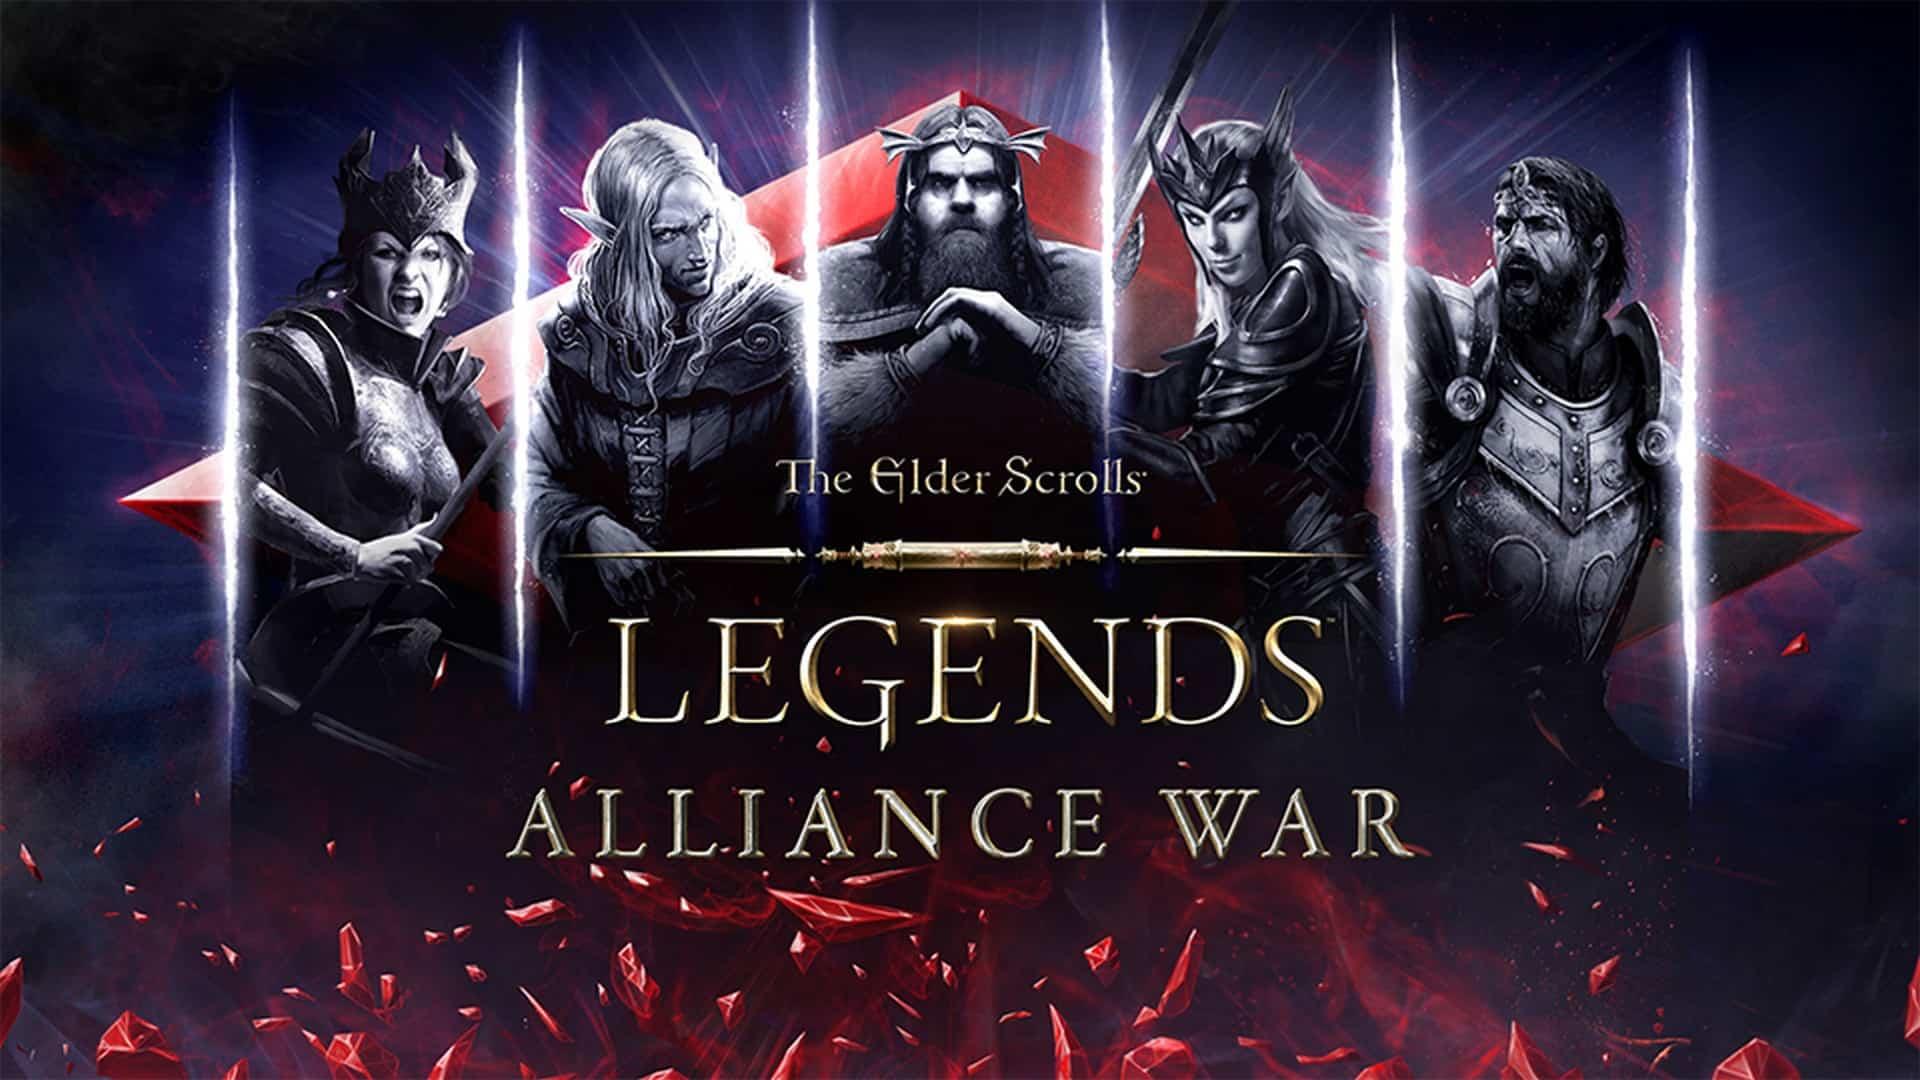 The Elder Scrolls: Legends – Alliance War Available Now